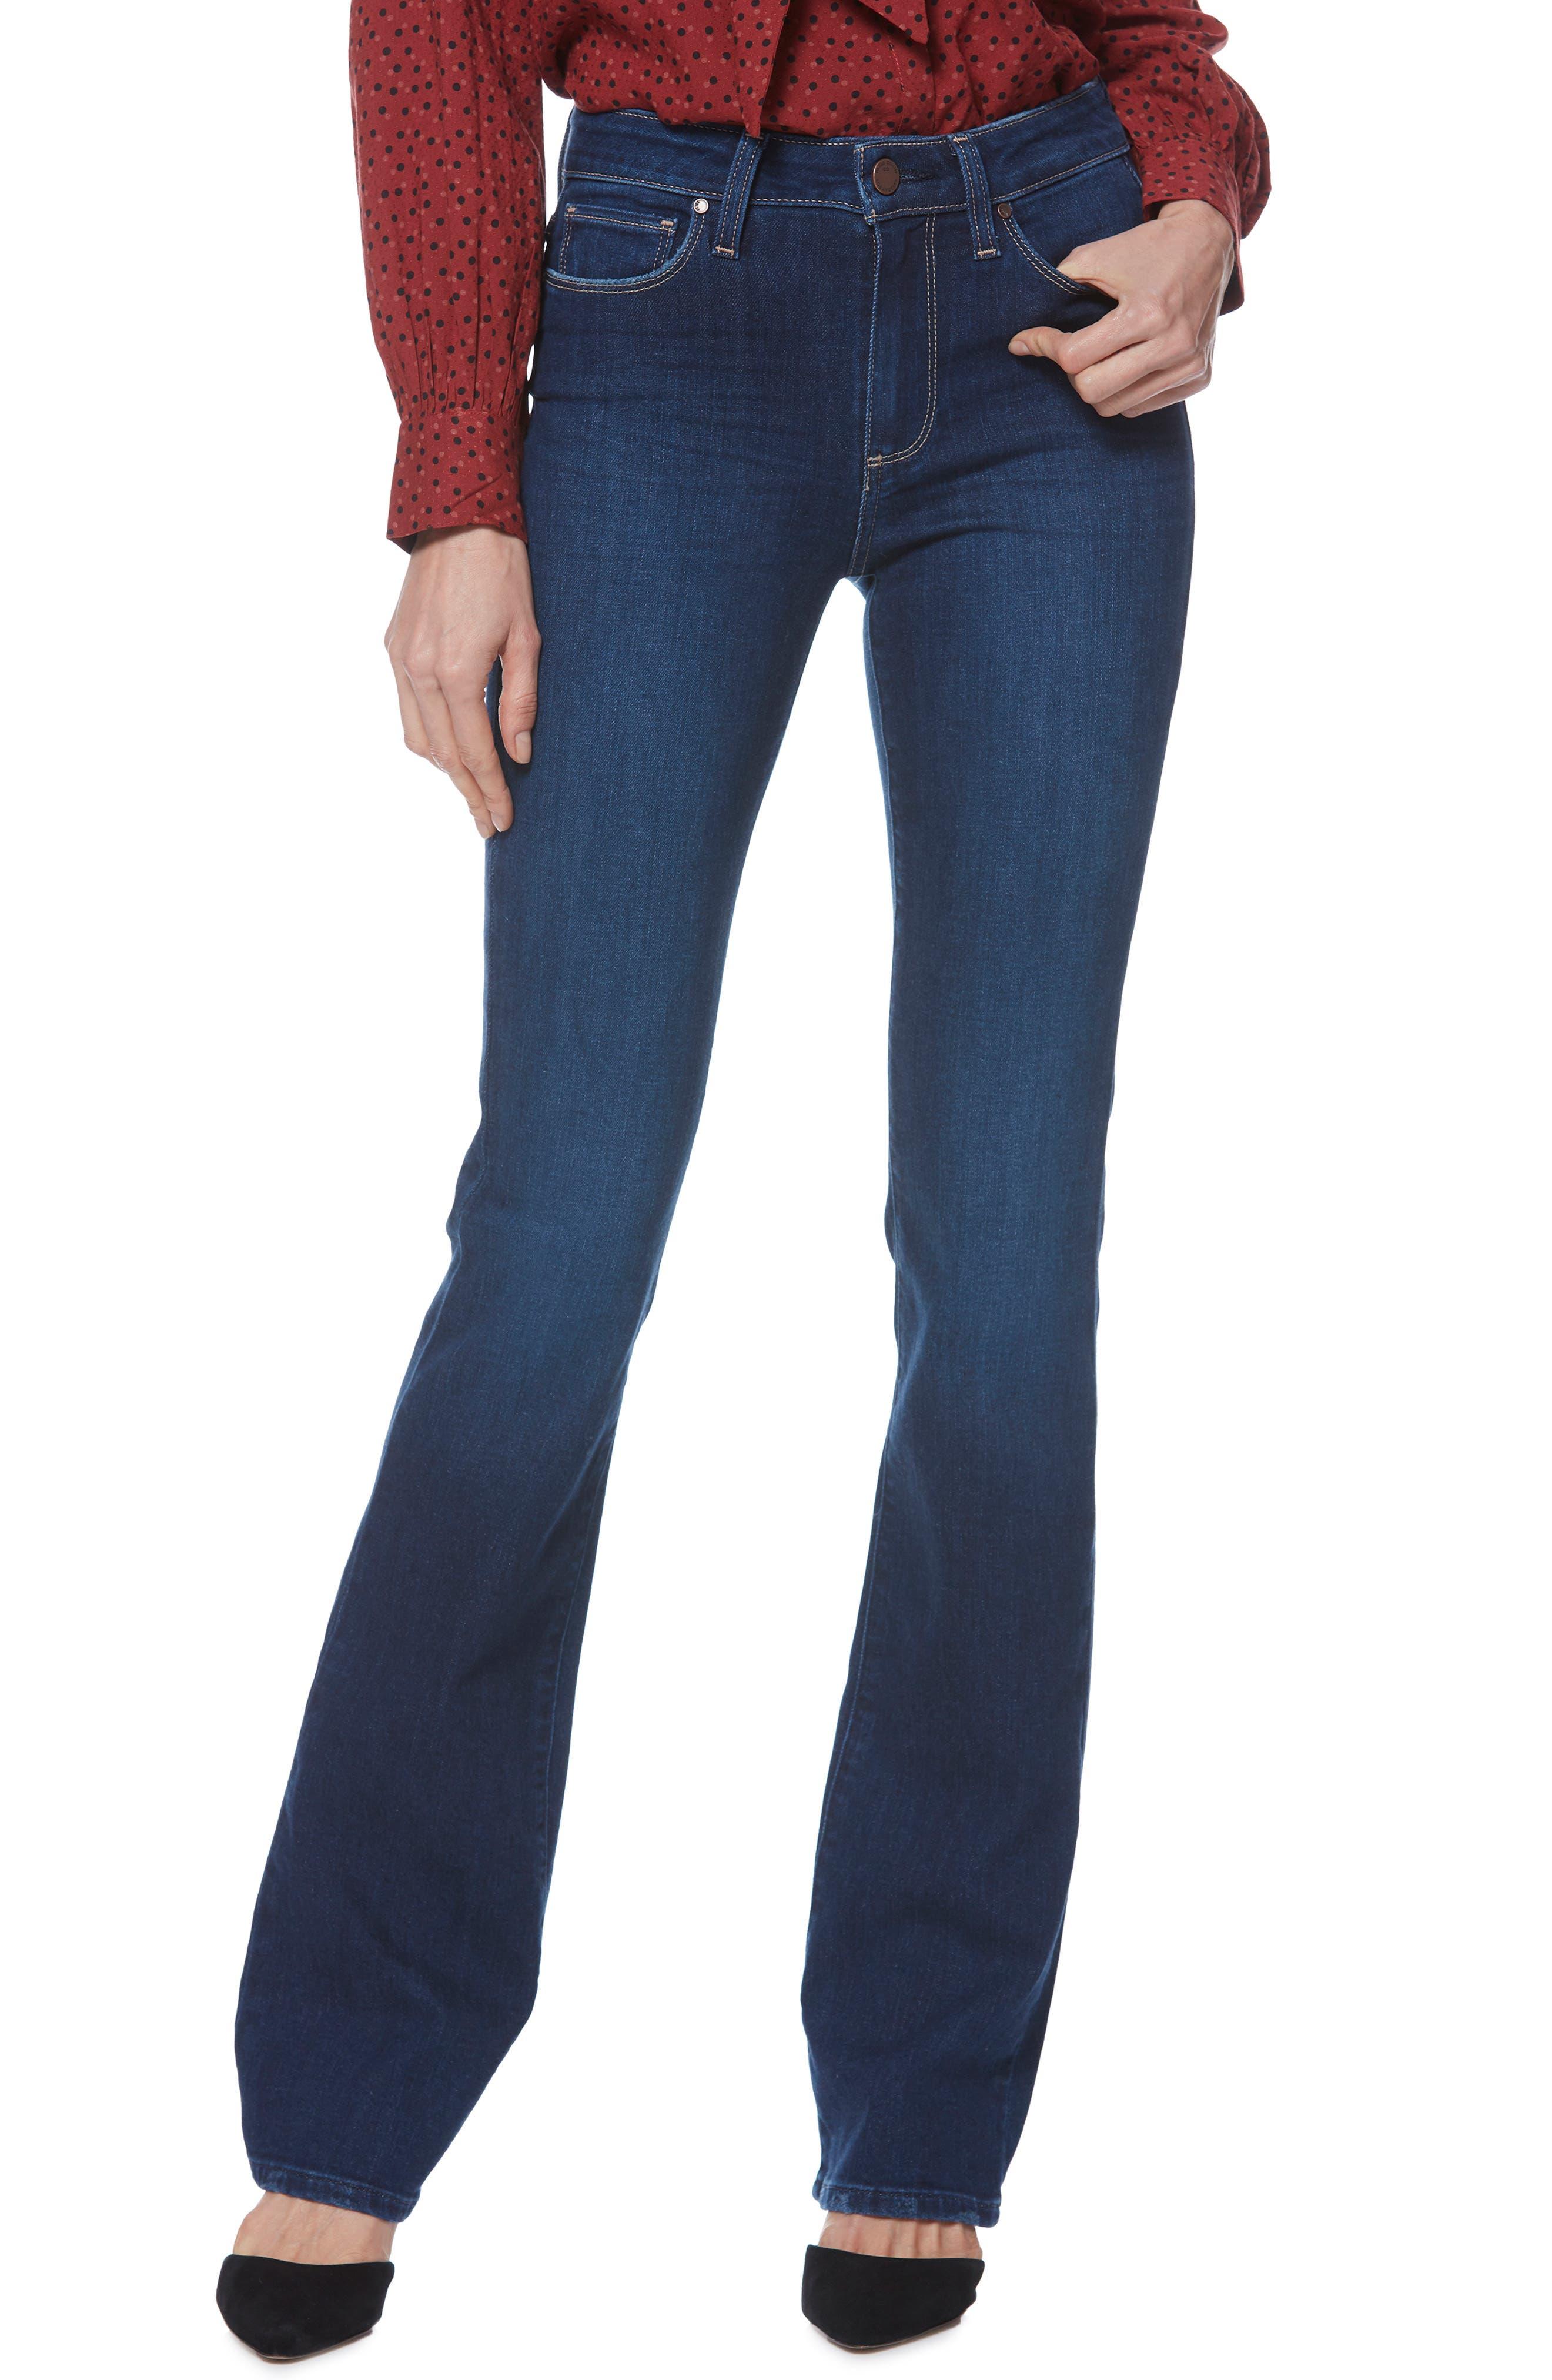 Transcend Vintage - Manhattan Bootcut Jeans,                         Main,                         color, POMPEII